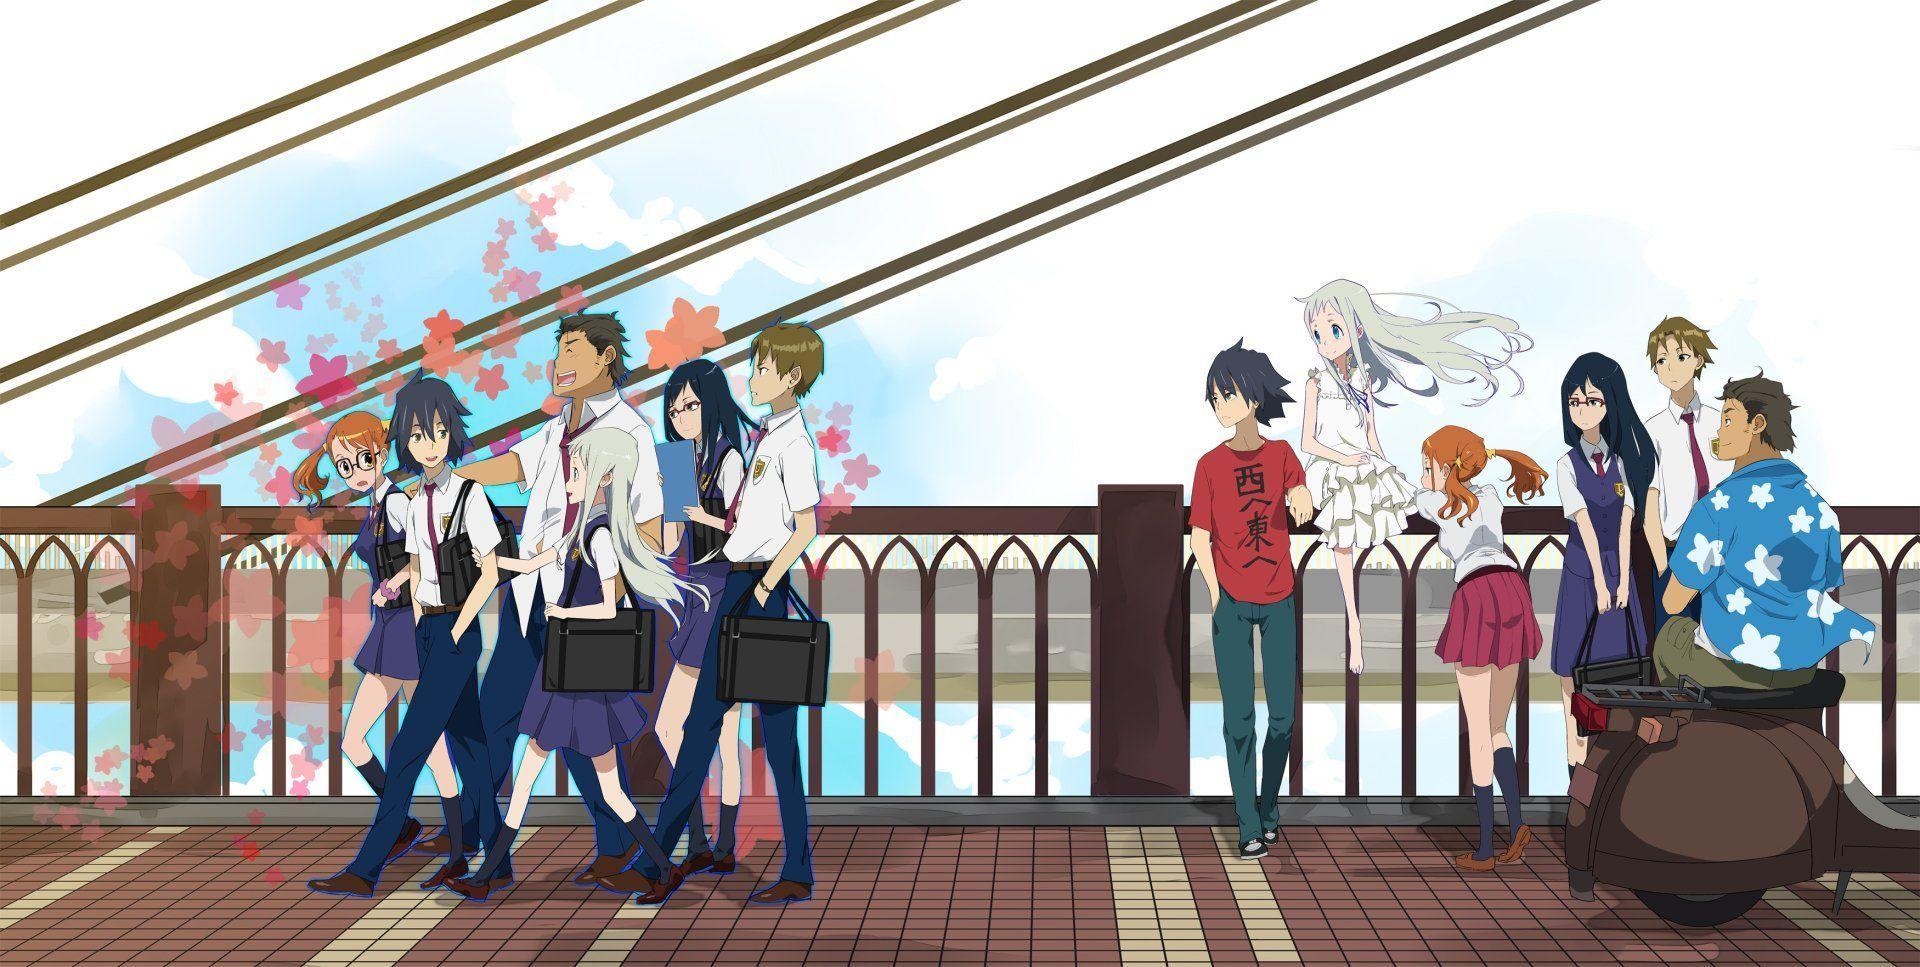 Anime Anohana Papel de Parede anime anohana papel